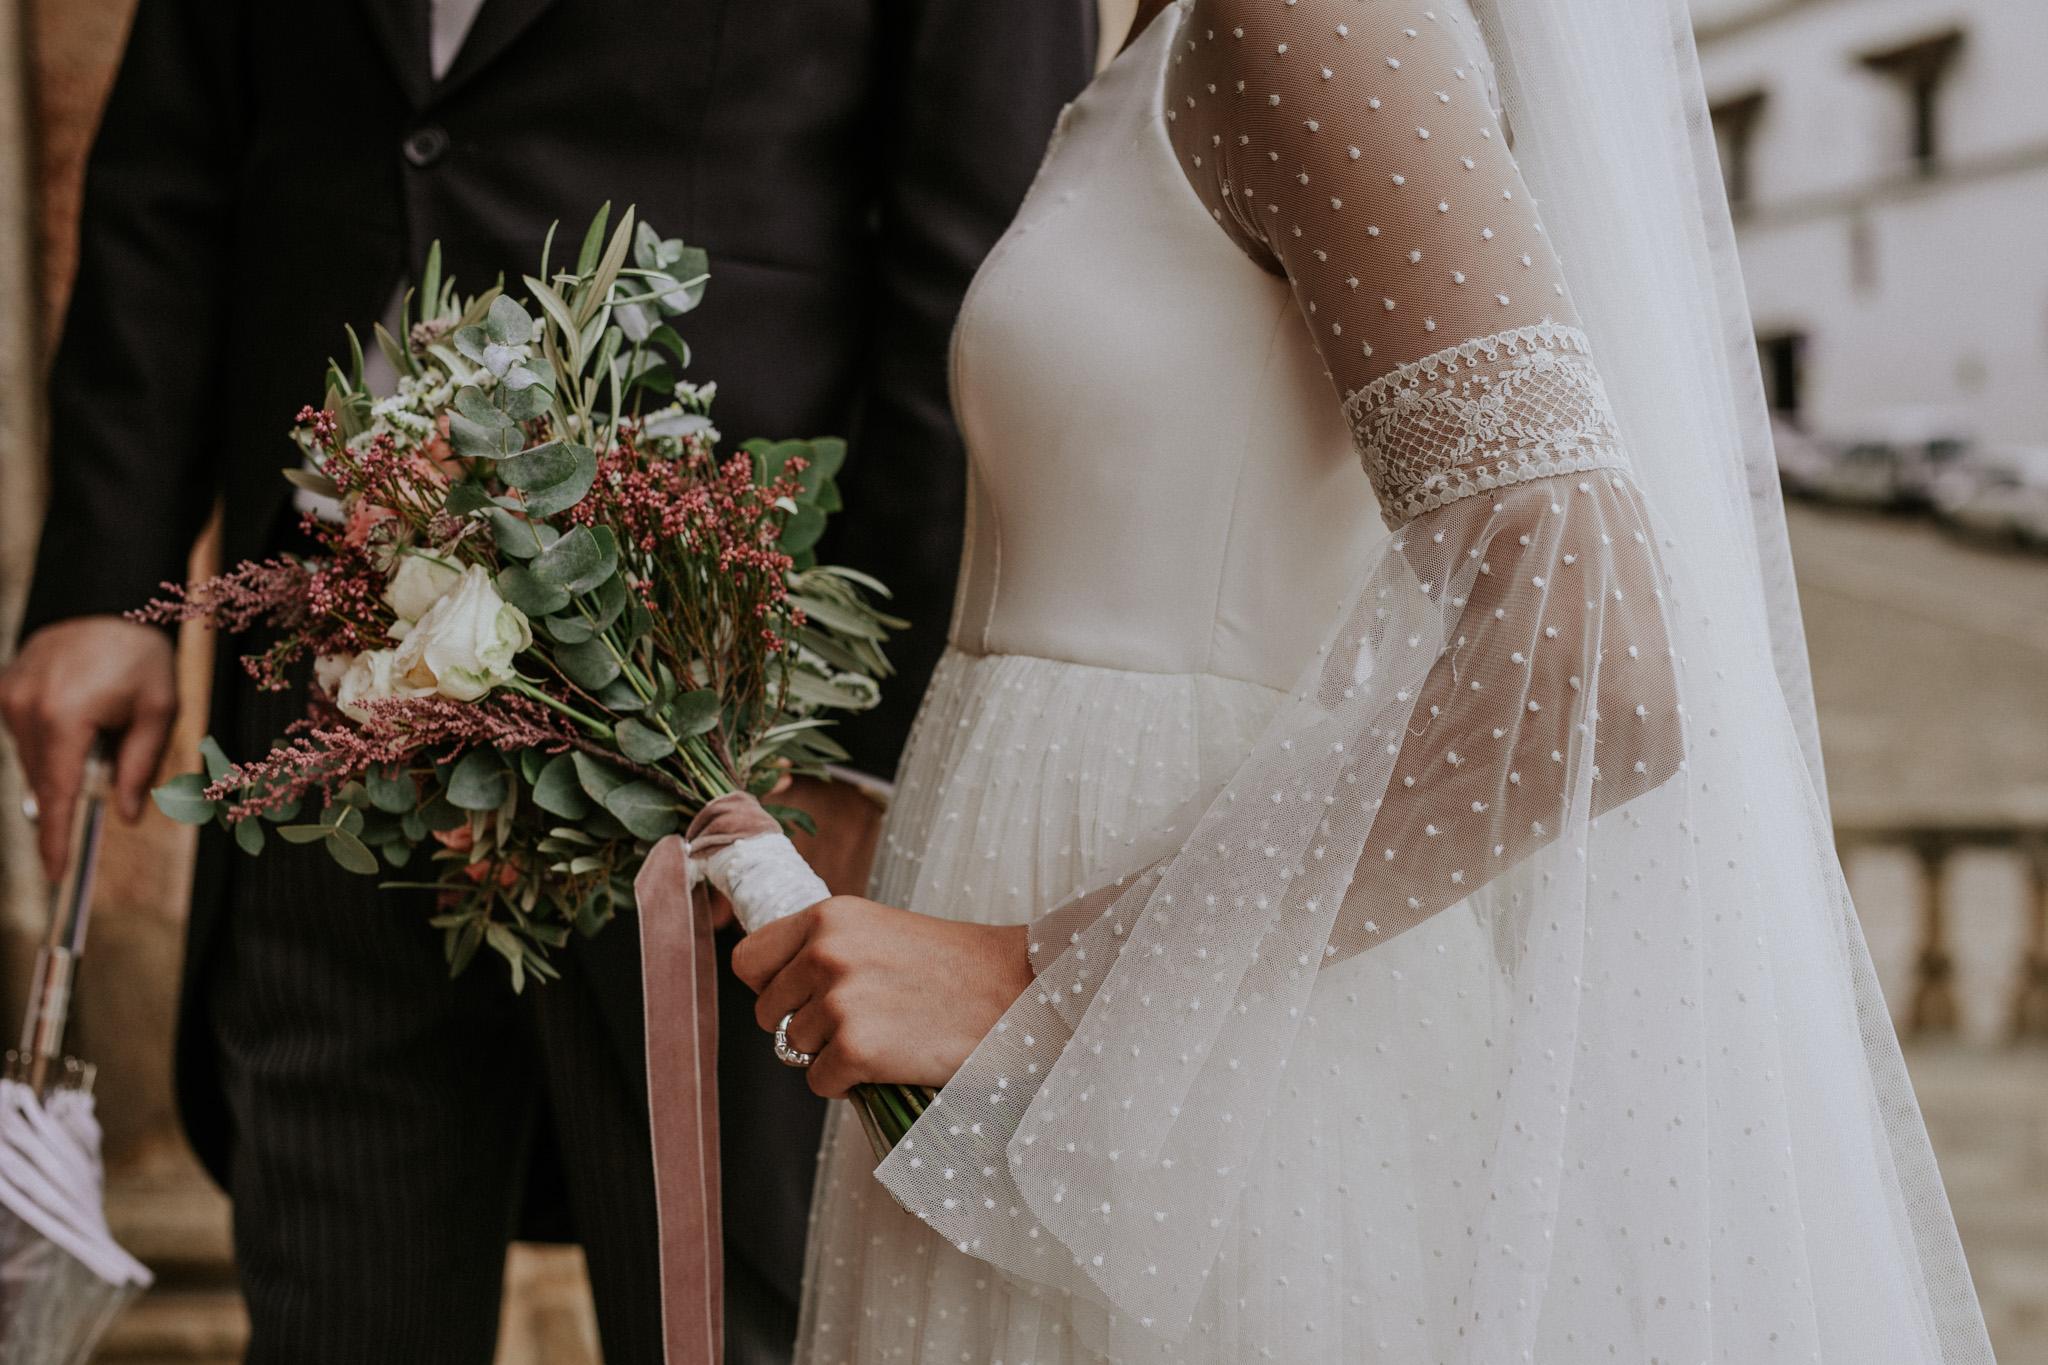 fotografia-boda-wedding-photographer-spain-concorazon-103